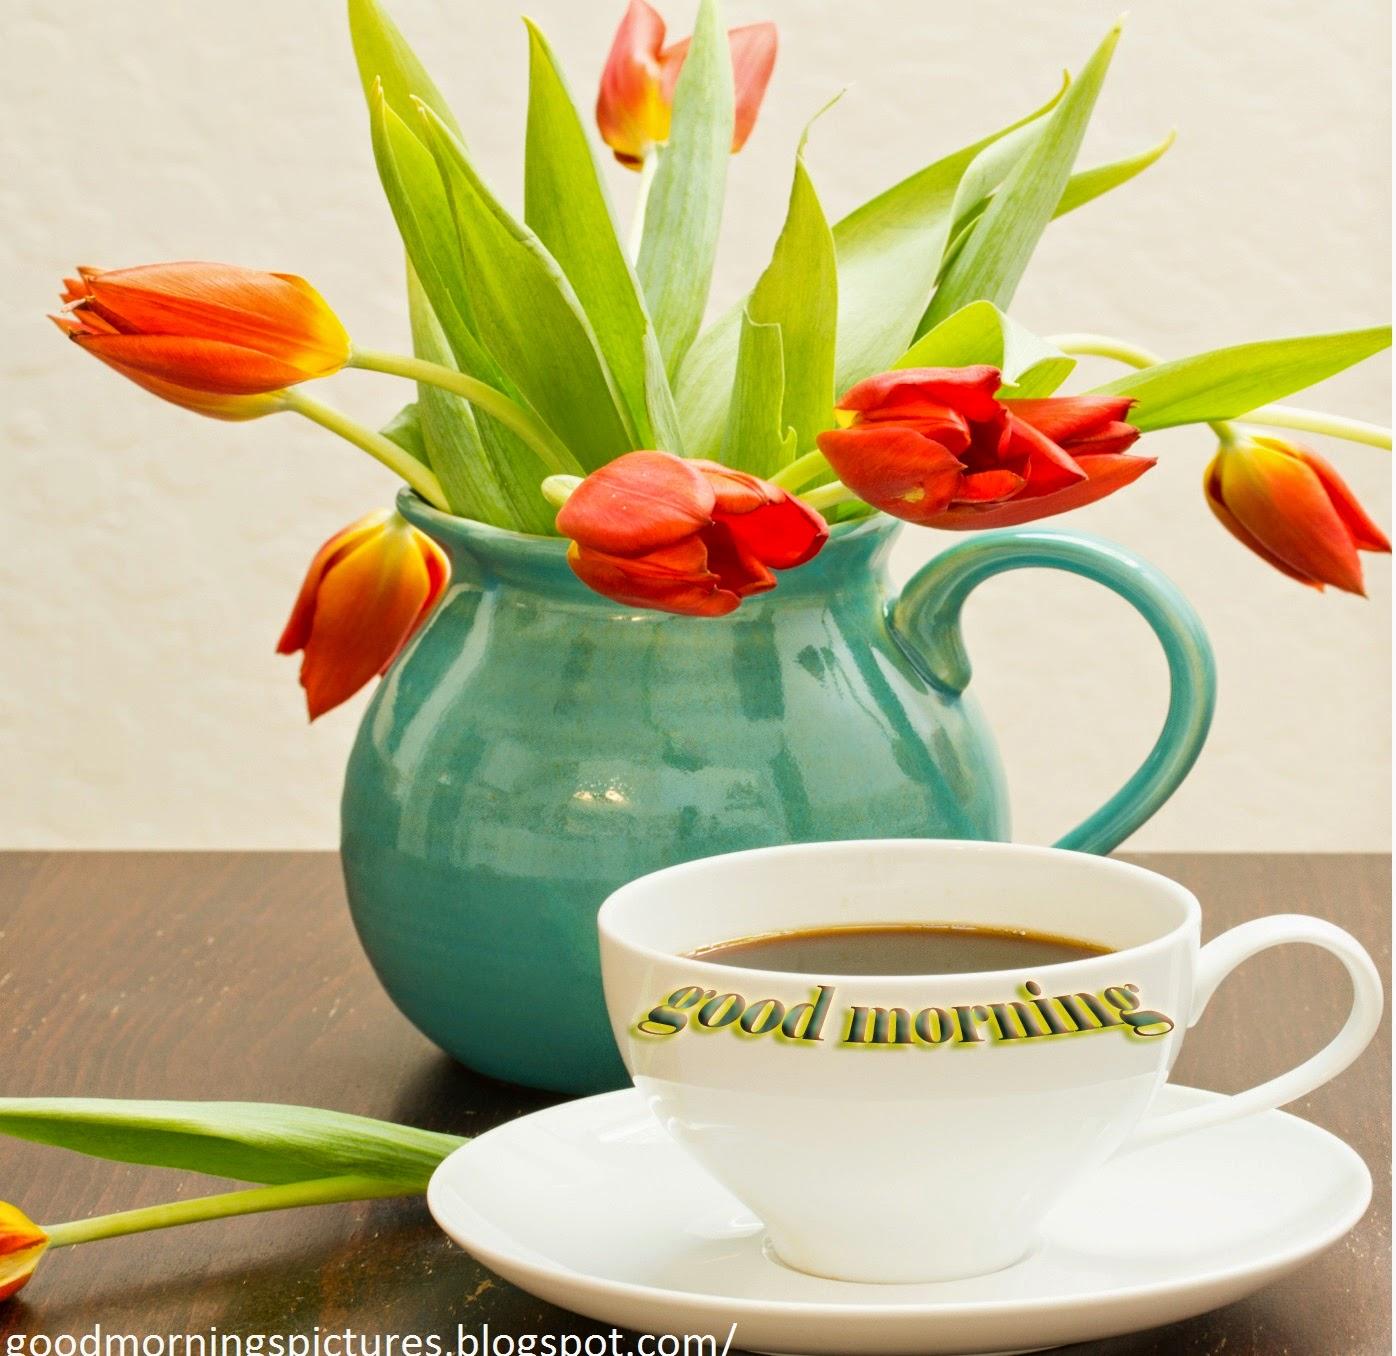 Top 20 good morning beautiful pictures free download beautiful beautiful good morning cup pictures izmirmasajfo